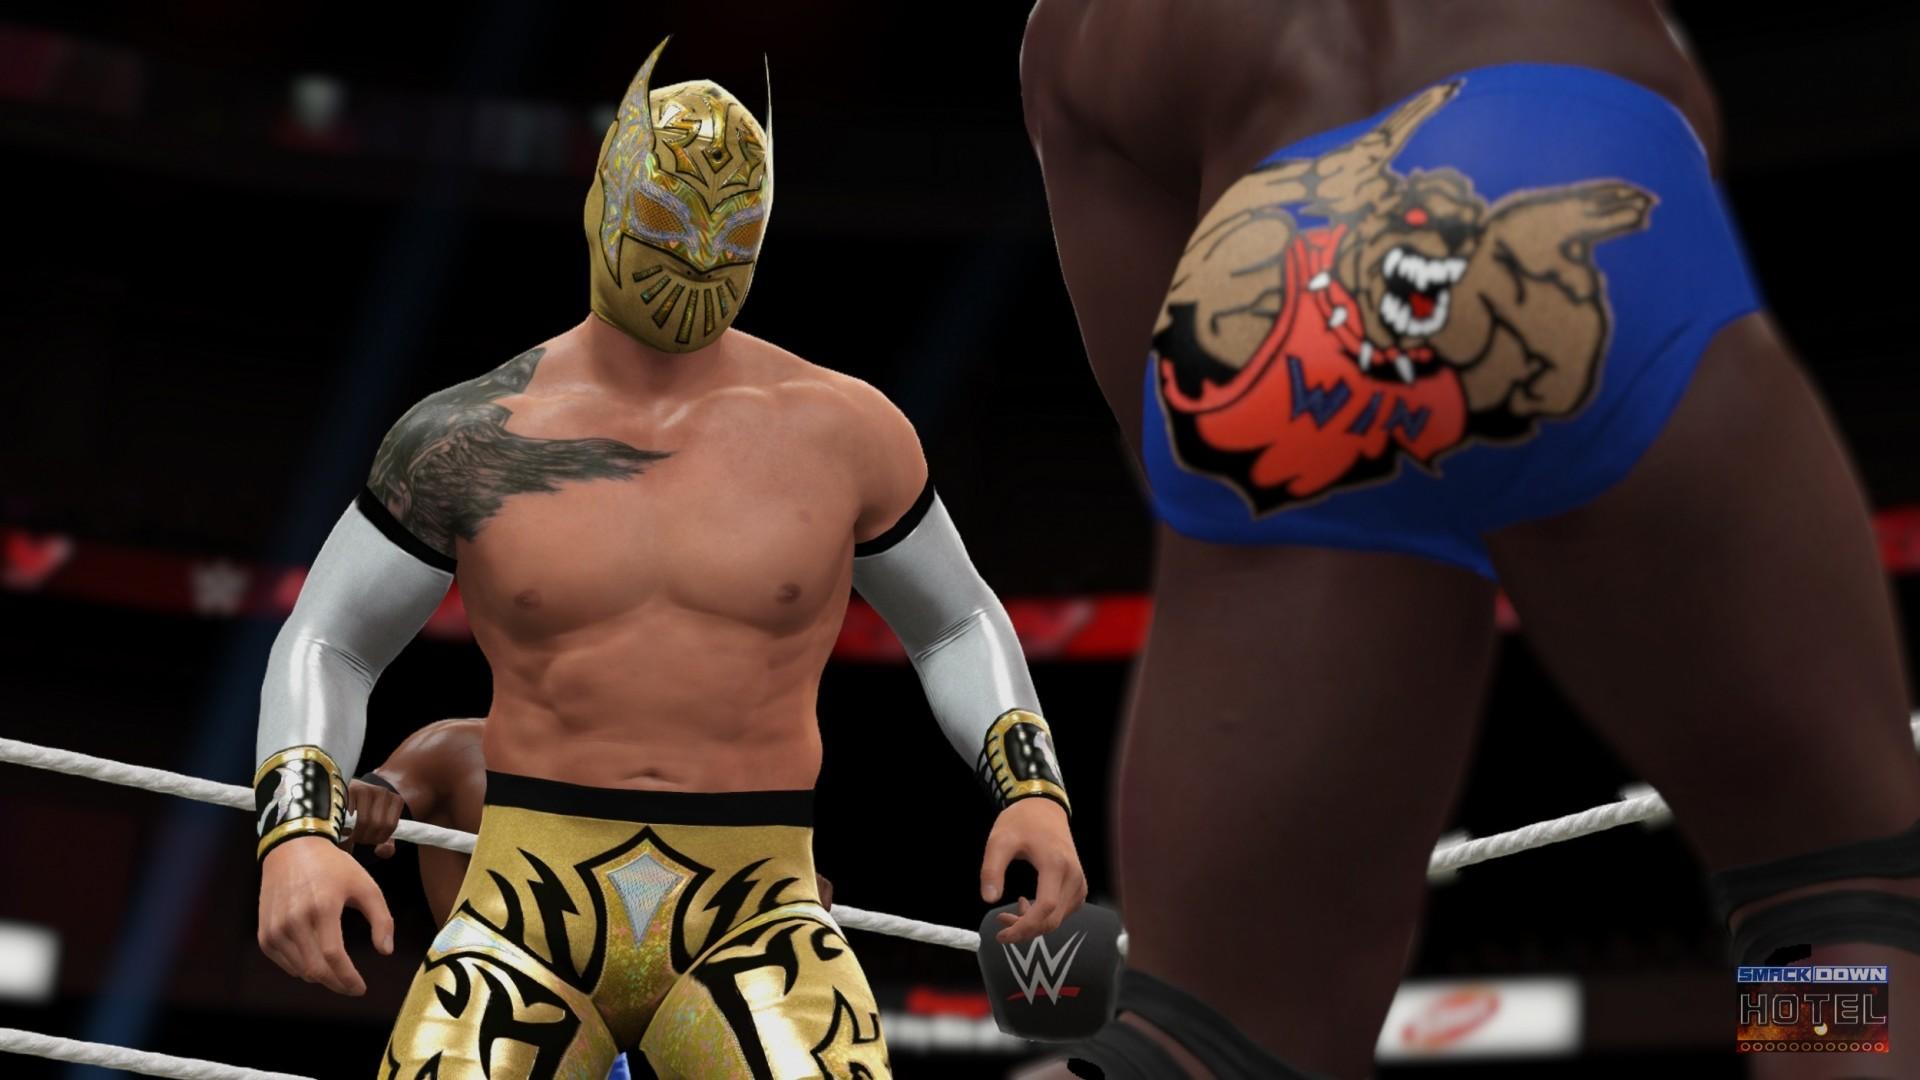 … LuchaDragonsMove WWE2K16 SinCara WWE2K16 CesaroKidd2